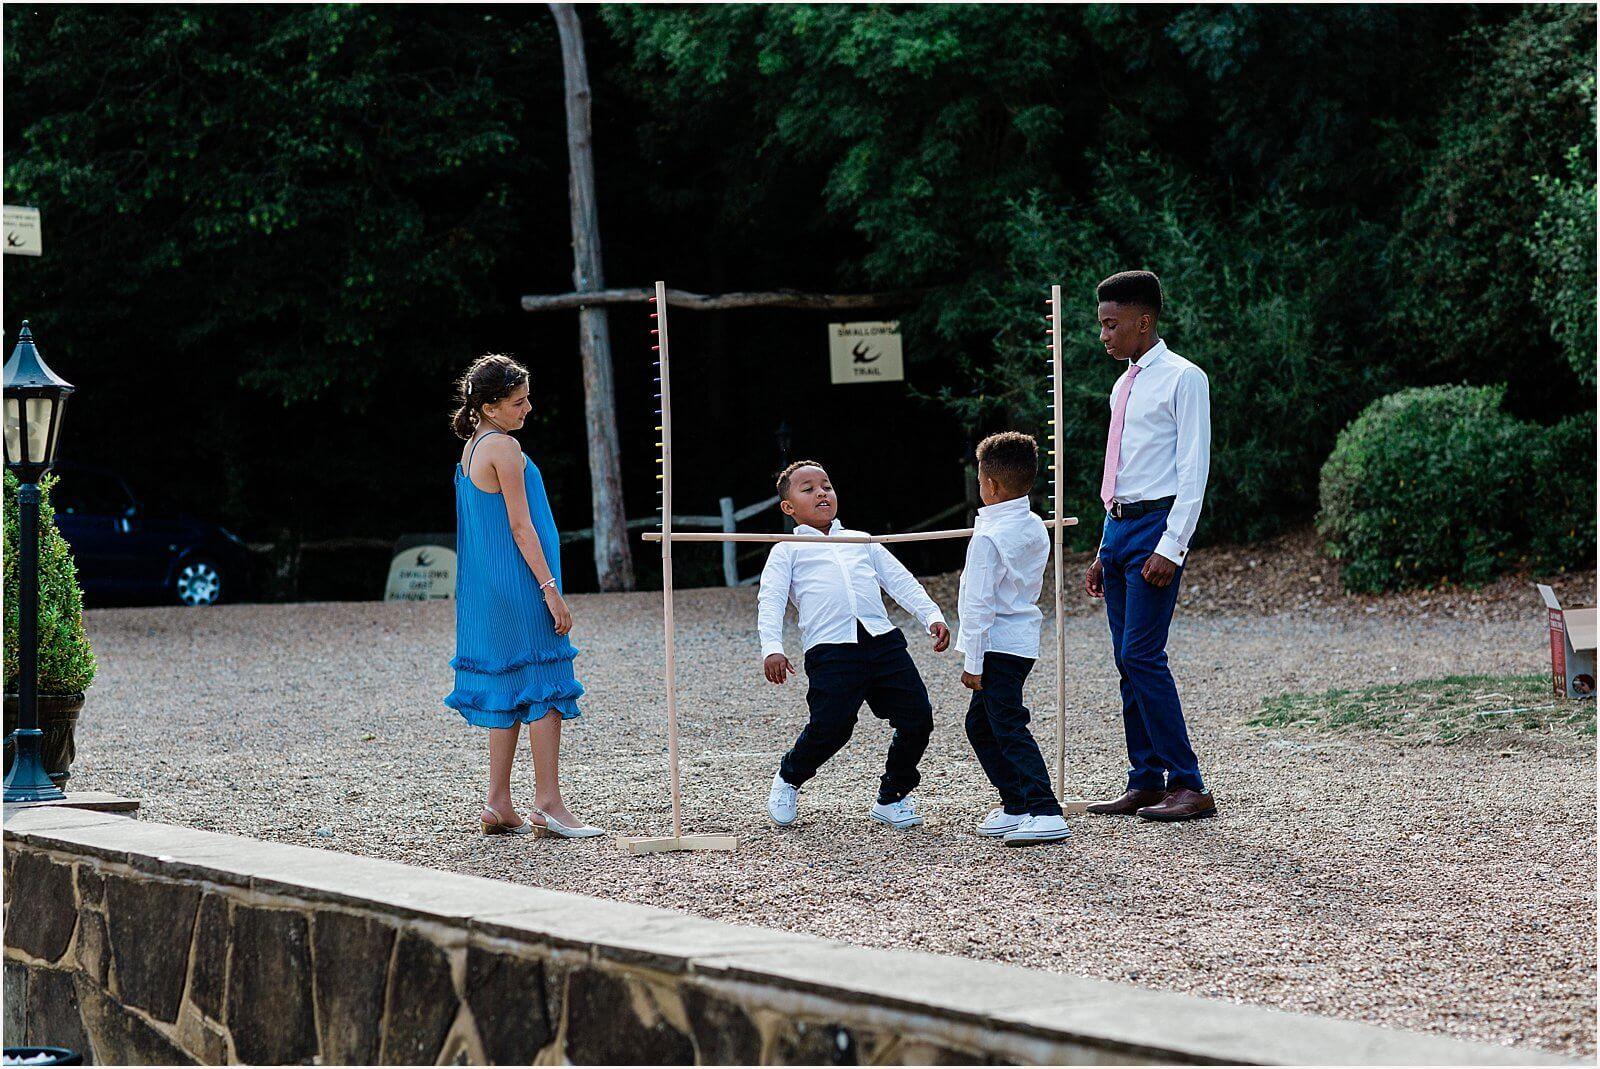 Swallows Oast Wedding - Jakki + Luke's barn wedding photography 58